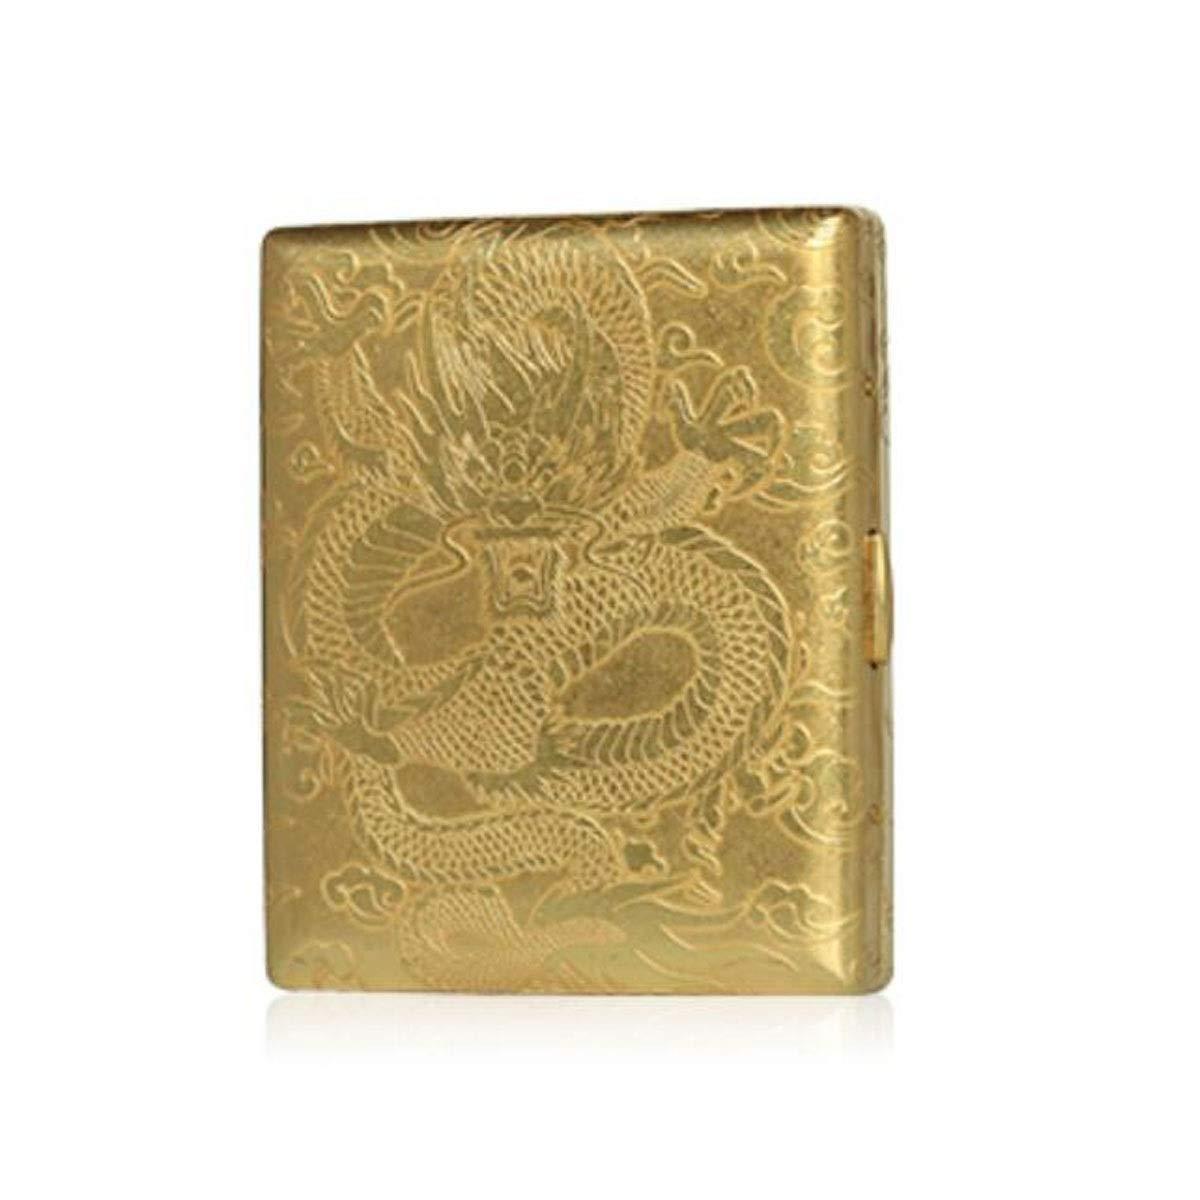 KALMAR Cigarette Case, Portable Metal Thin Double Open Cigarette Case, Vintage Copper Material, Size 9.5 8.0 1.6 cm, Gold Cigarette Box Cigar Protective Cover